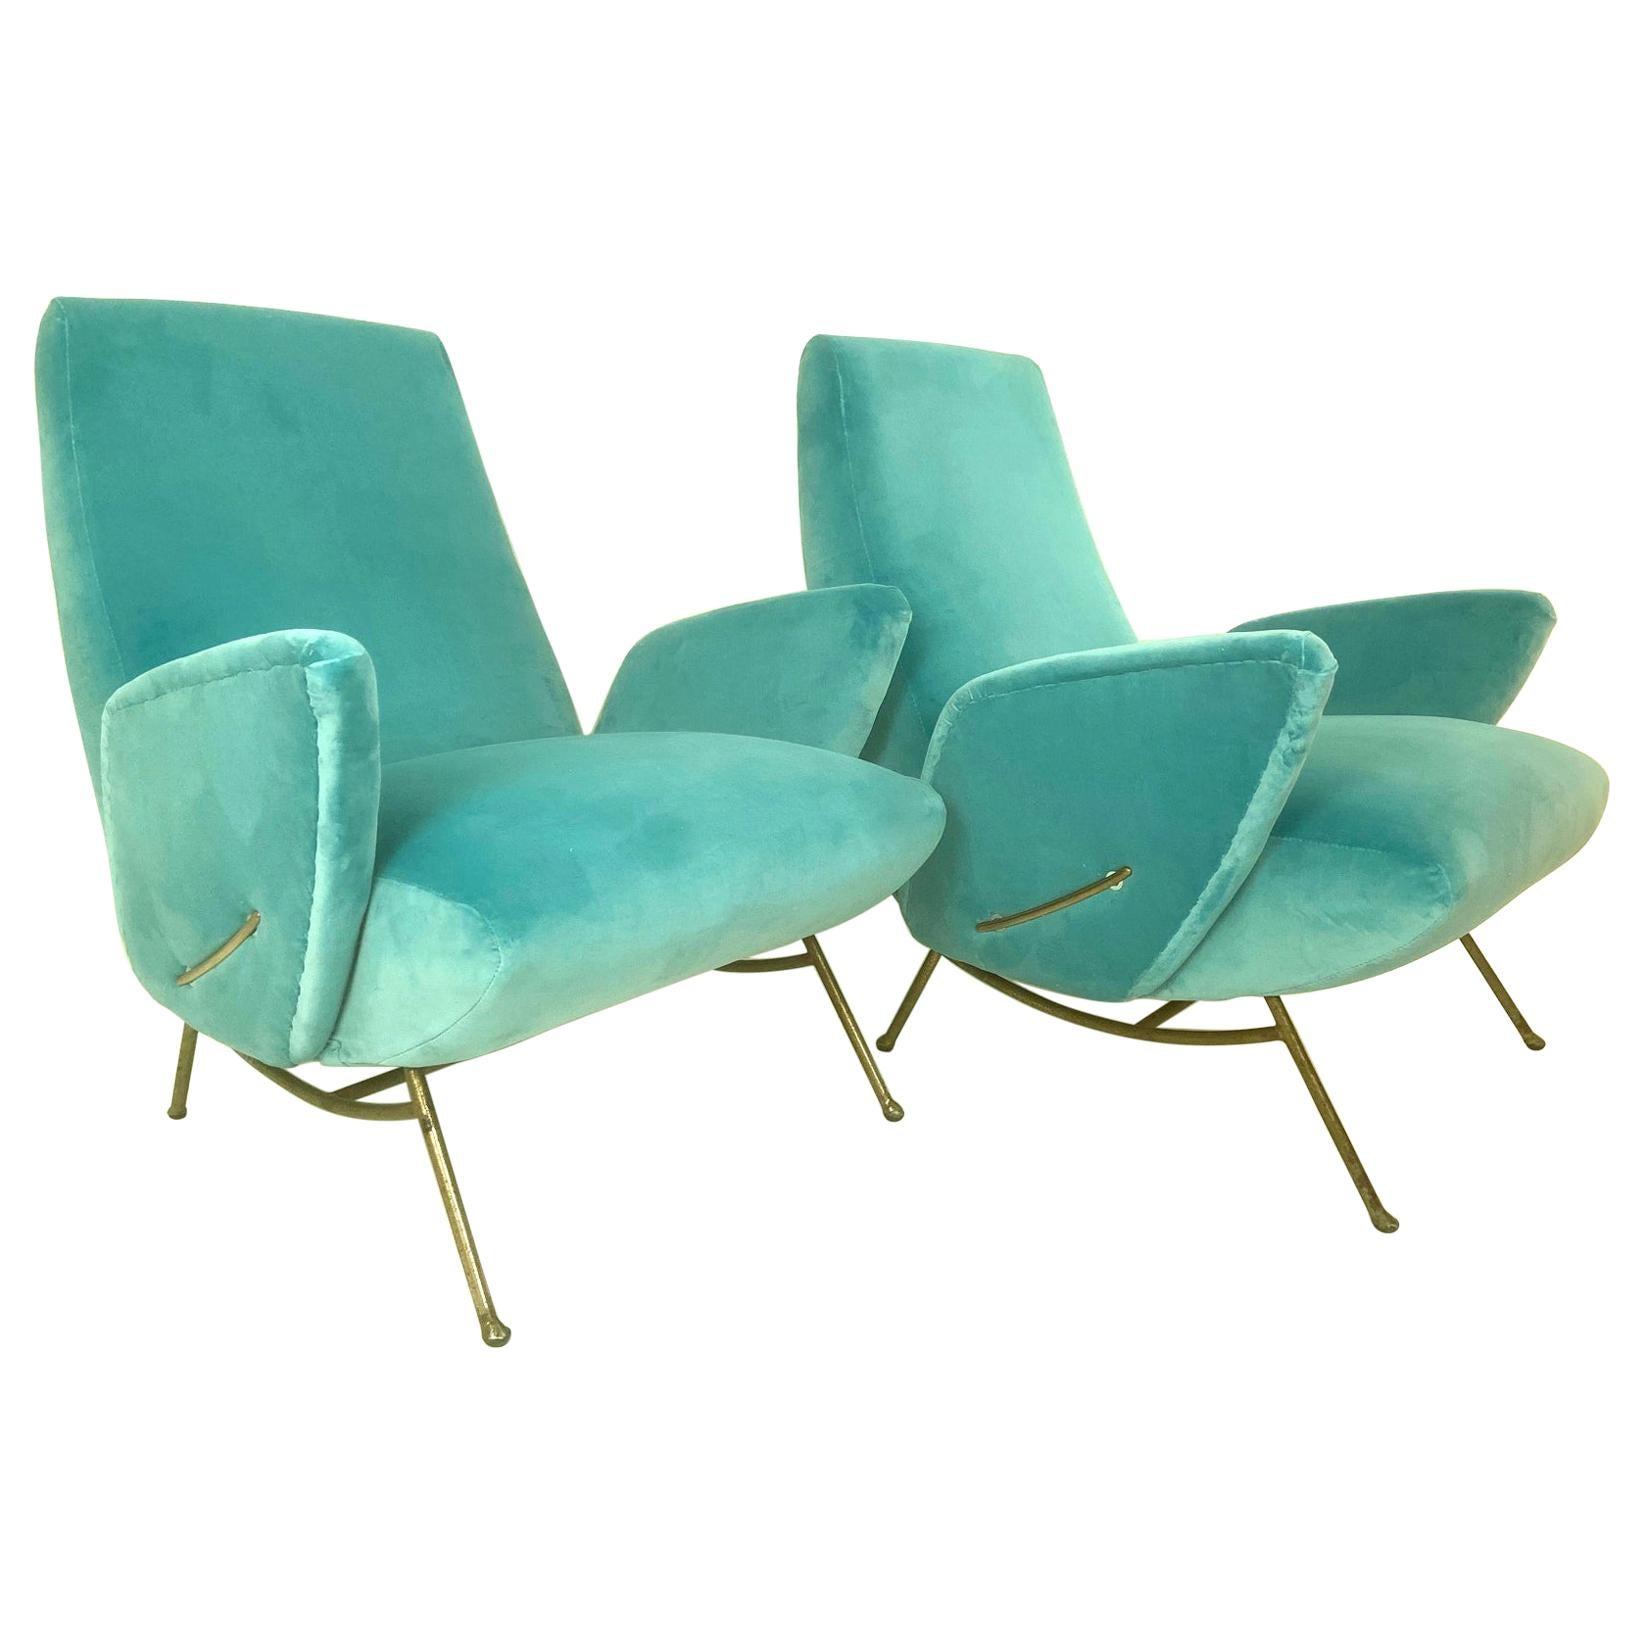 Nino Zoncada Italian Mid-Century Modern Pair of Turquoise Blue Armchairs, 1950